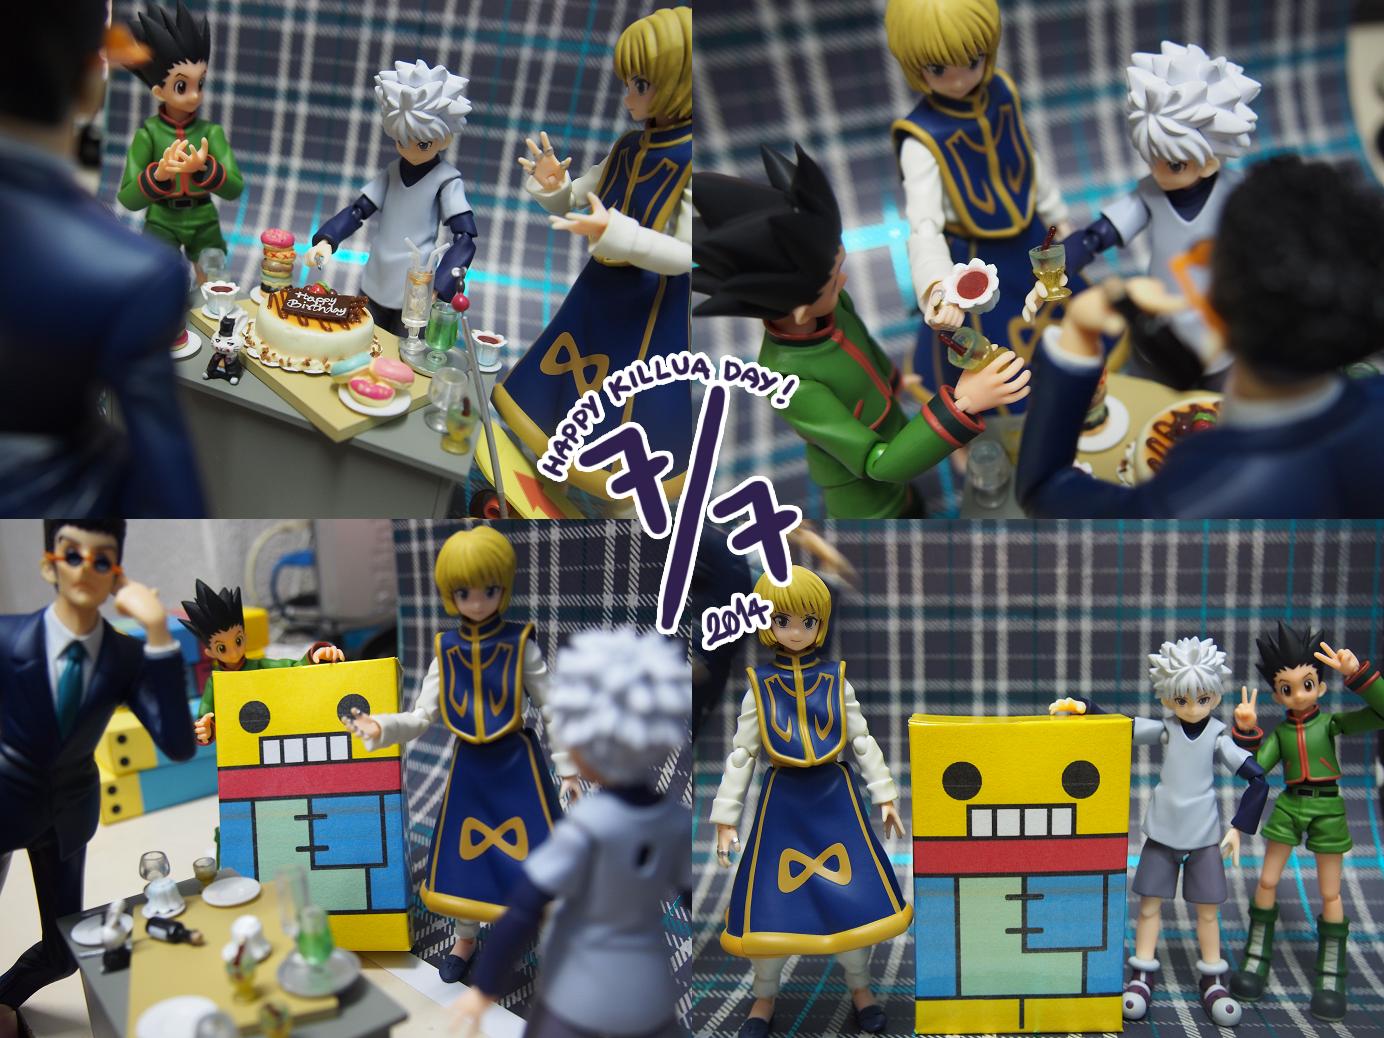 figma max_factory birthday banpresto shueisha asai_(apsy)_masaki hunter_x_hunter dx_figure togashi_yoshihiro gon_freecss kurapika leorio killua_zoldyck vap madhouse